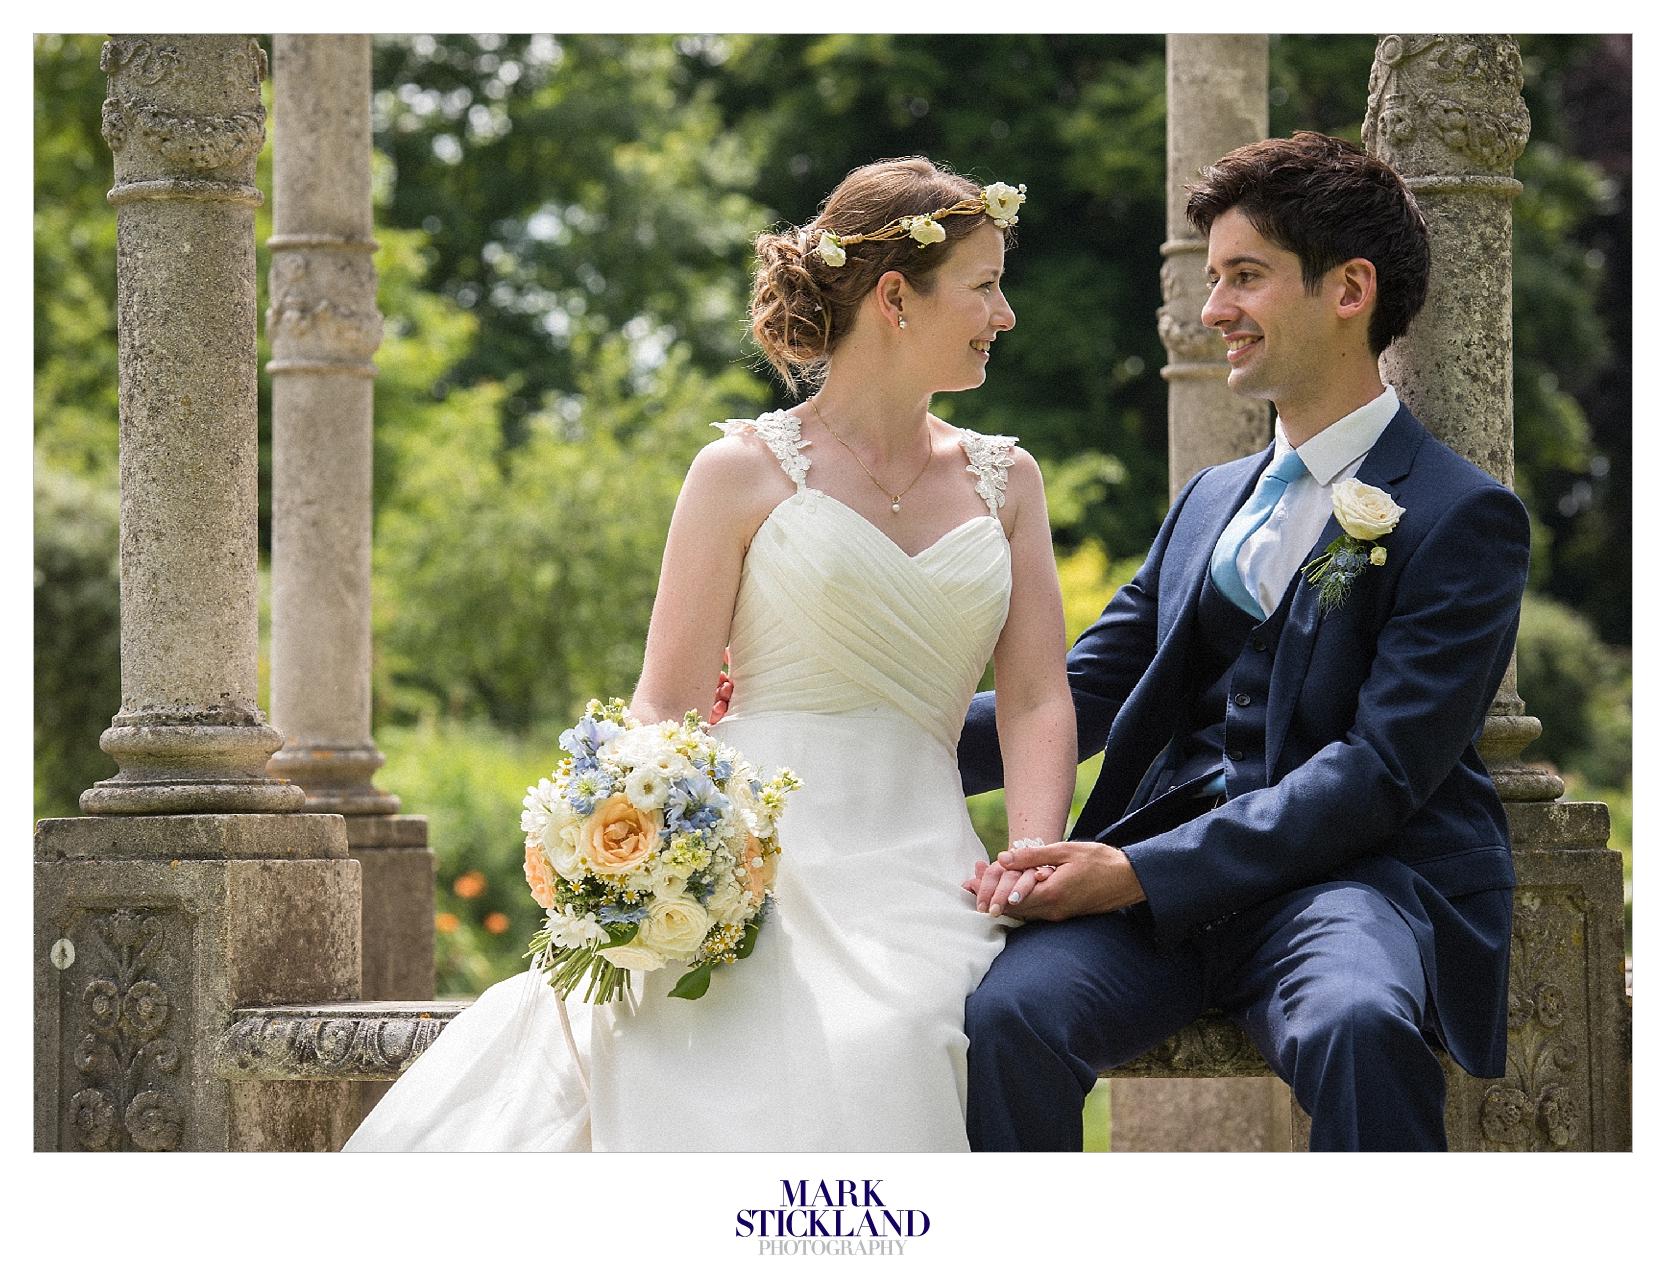 Springhead_wedding_fontmell magna_dorset_0013b